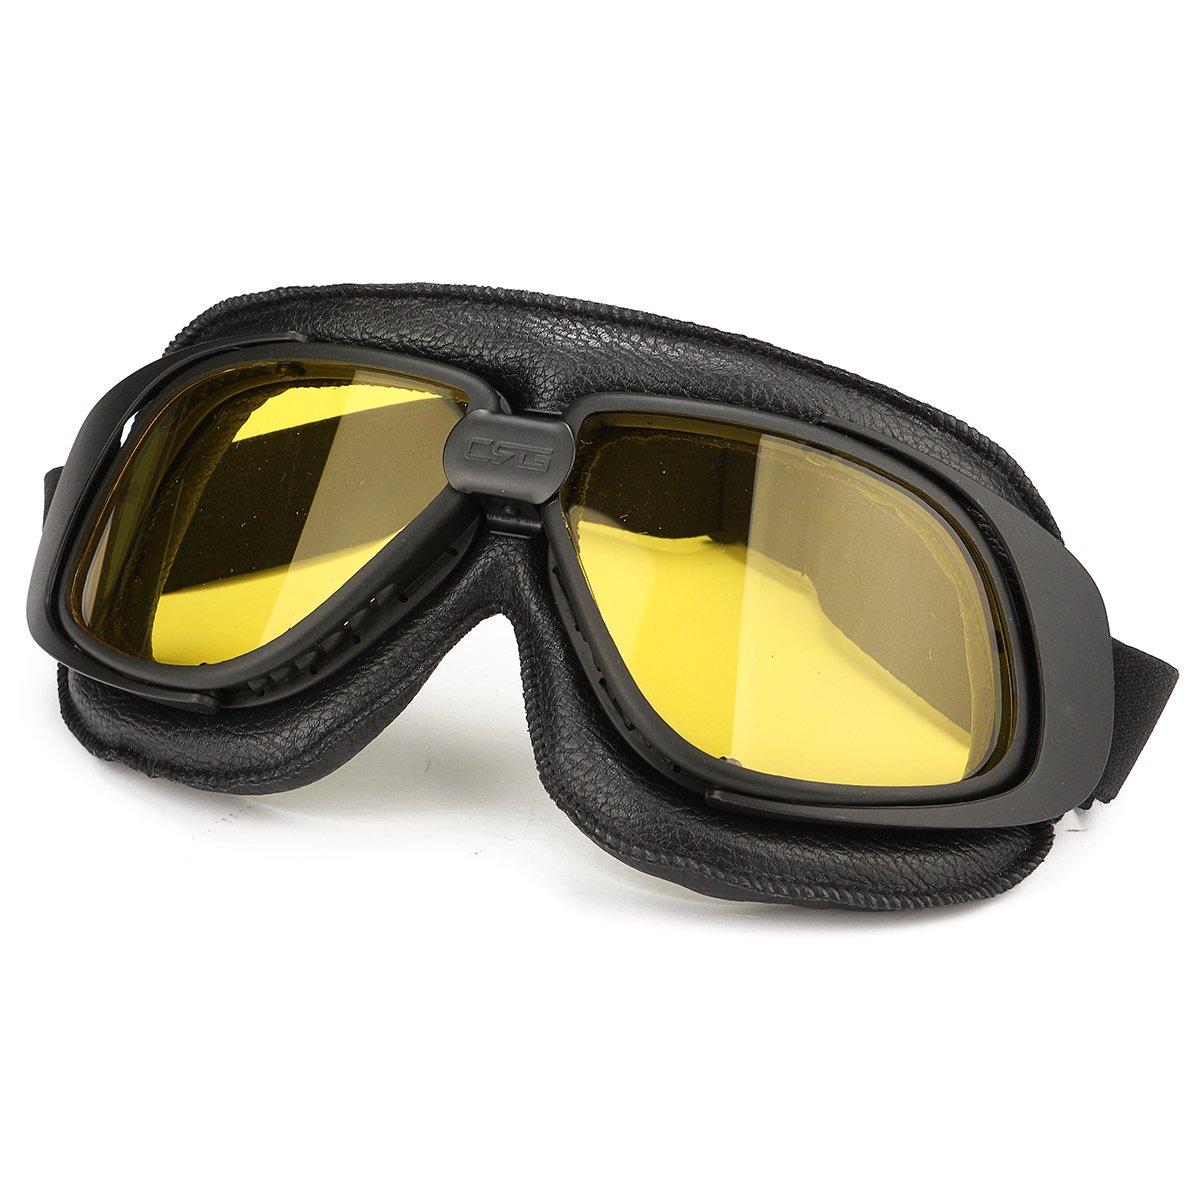 Wooya Gafas De Moto Moto Moto Casco Ojo Protecci/ón Gafas-Amarillo